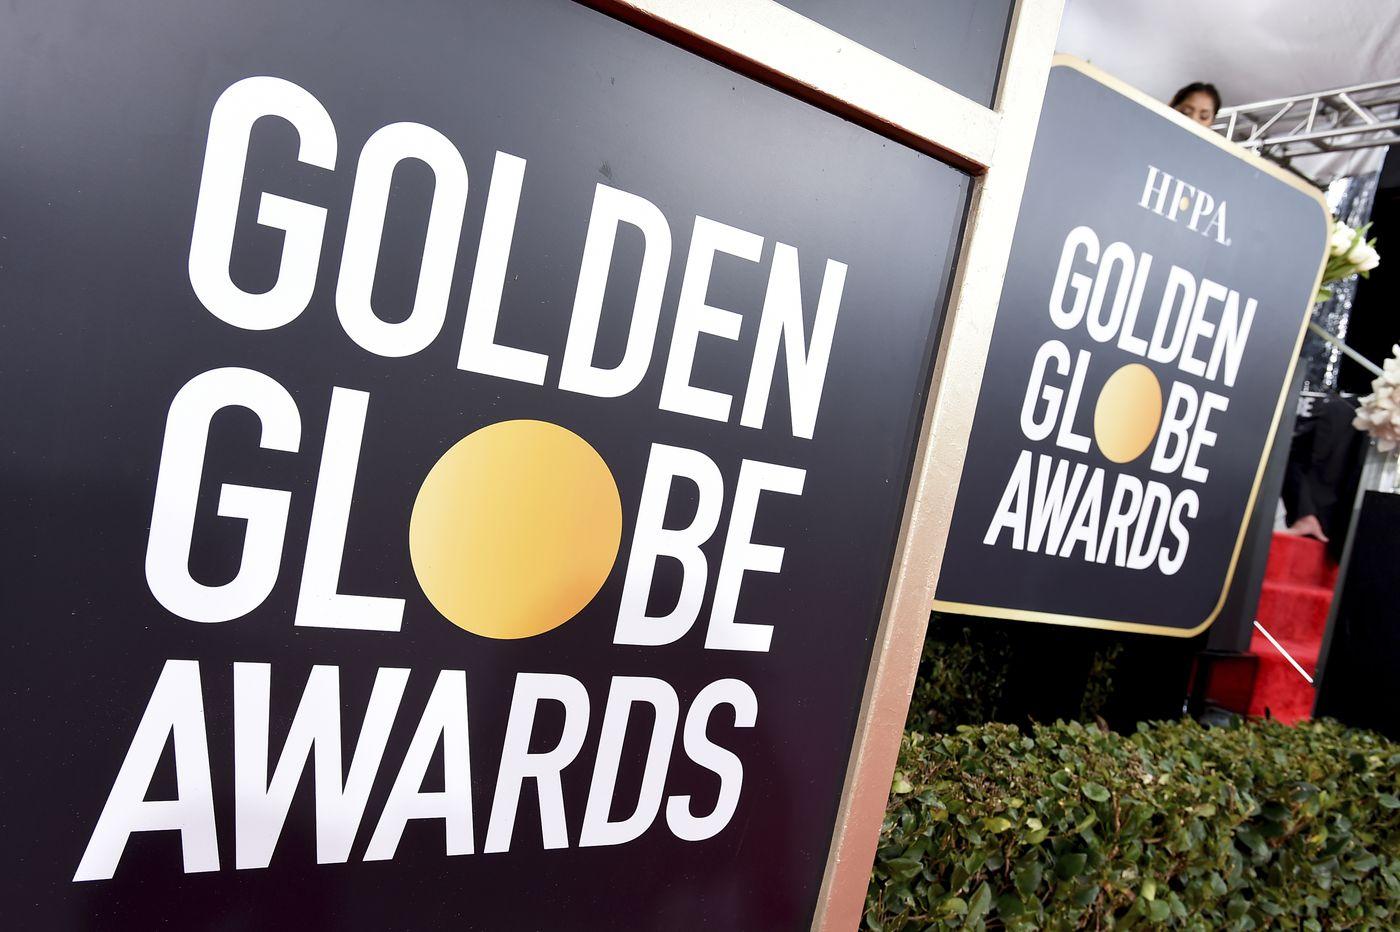 Golden Globes rescheduled for Feb. 28 because of coronavirus